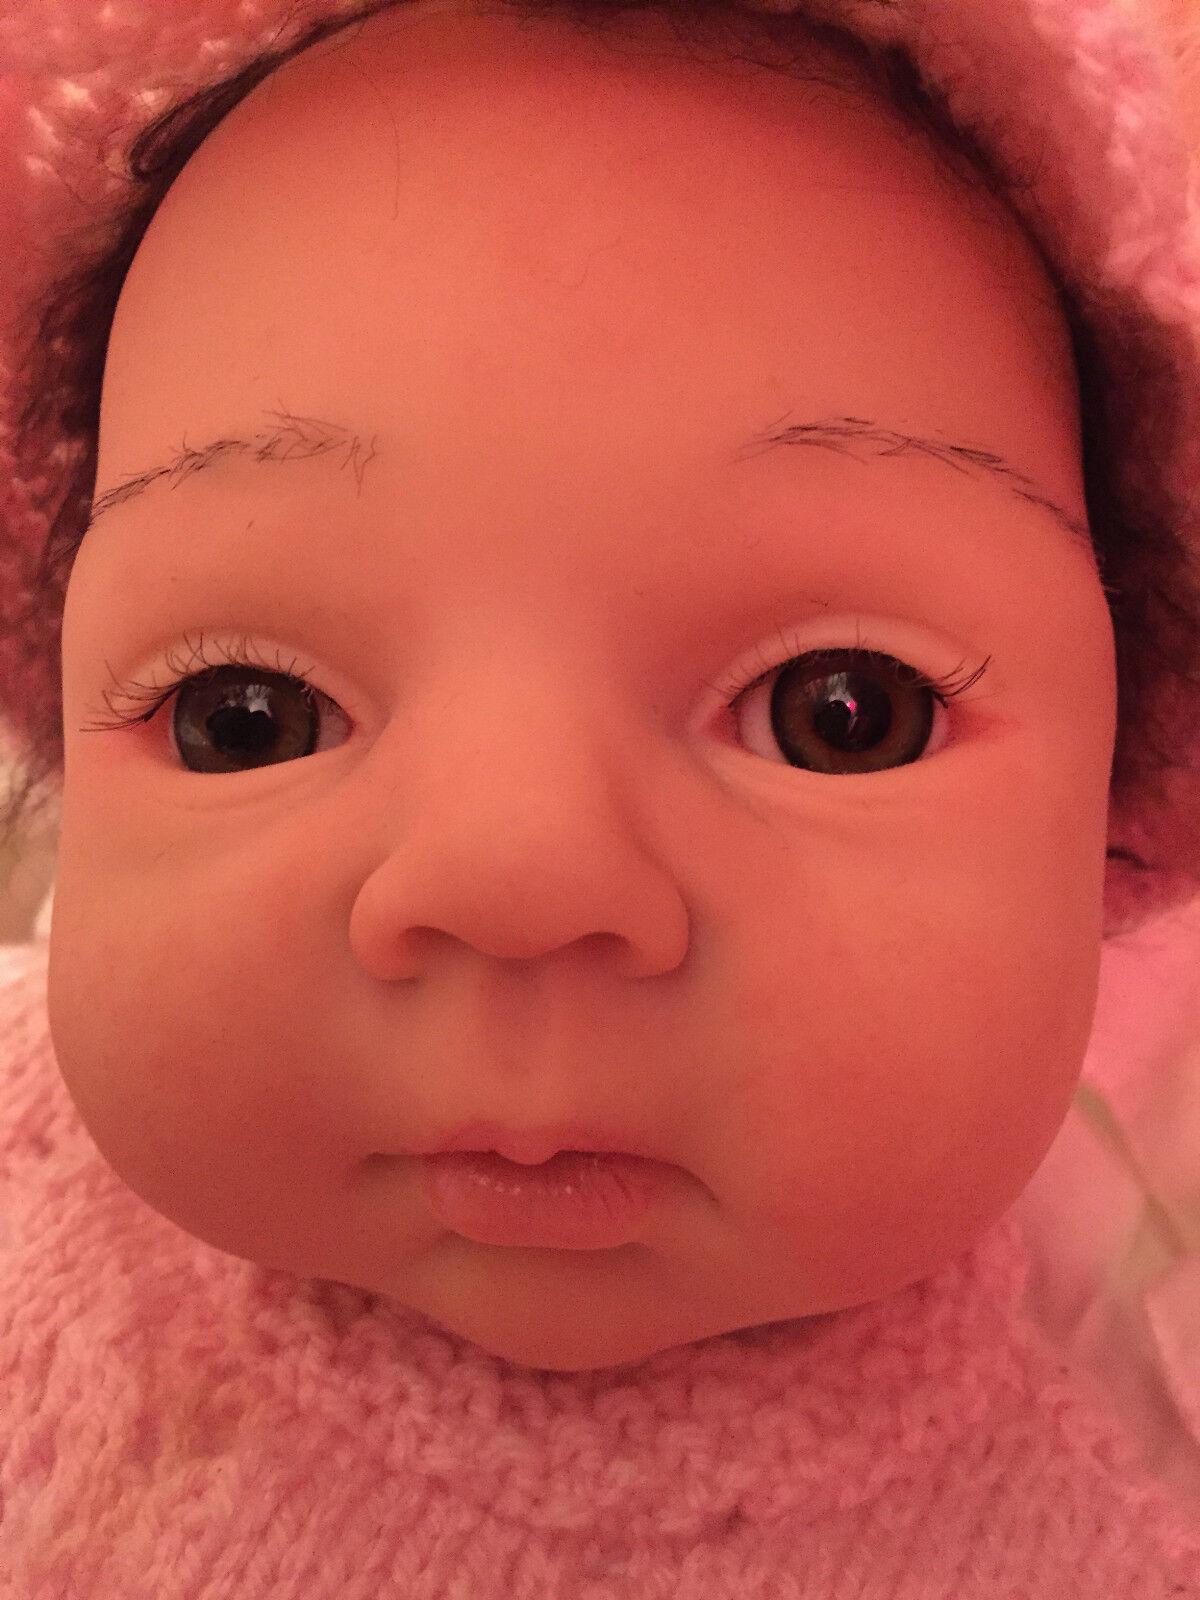 Reborn reallife Baby la dulce mia de adrie stoete coleccionista muñeca artistas muñeca